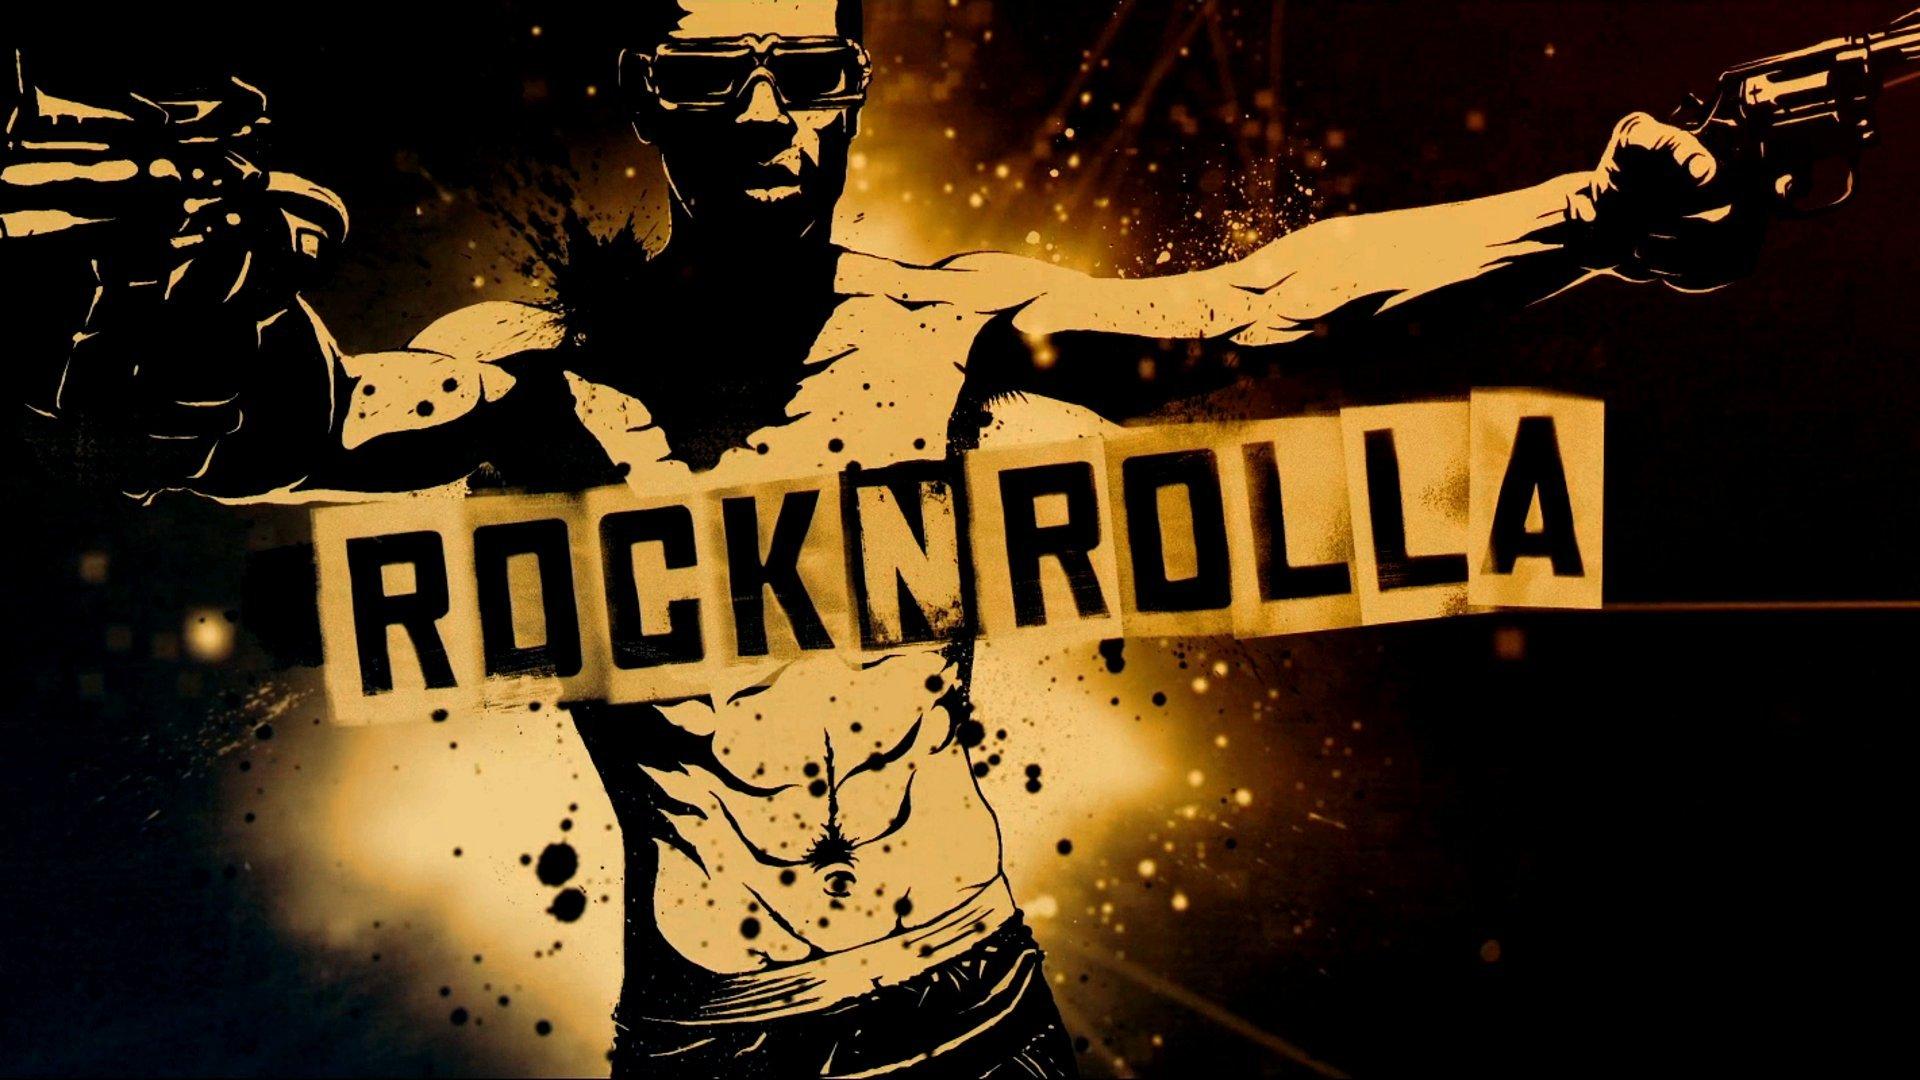 Rock'n'rolla Macguffin